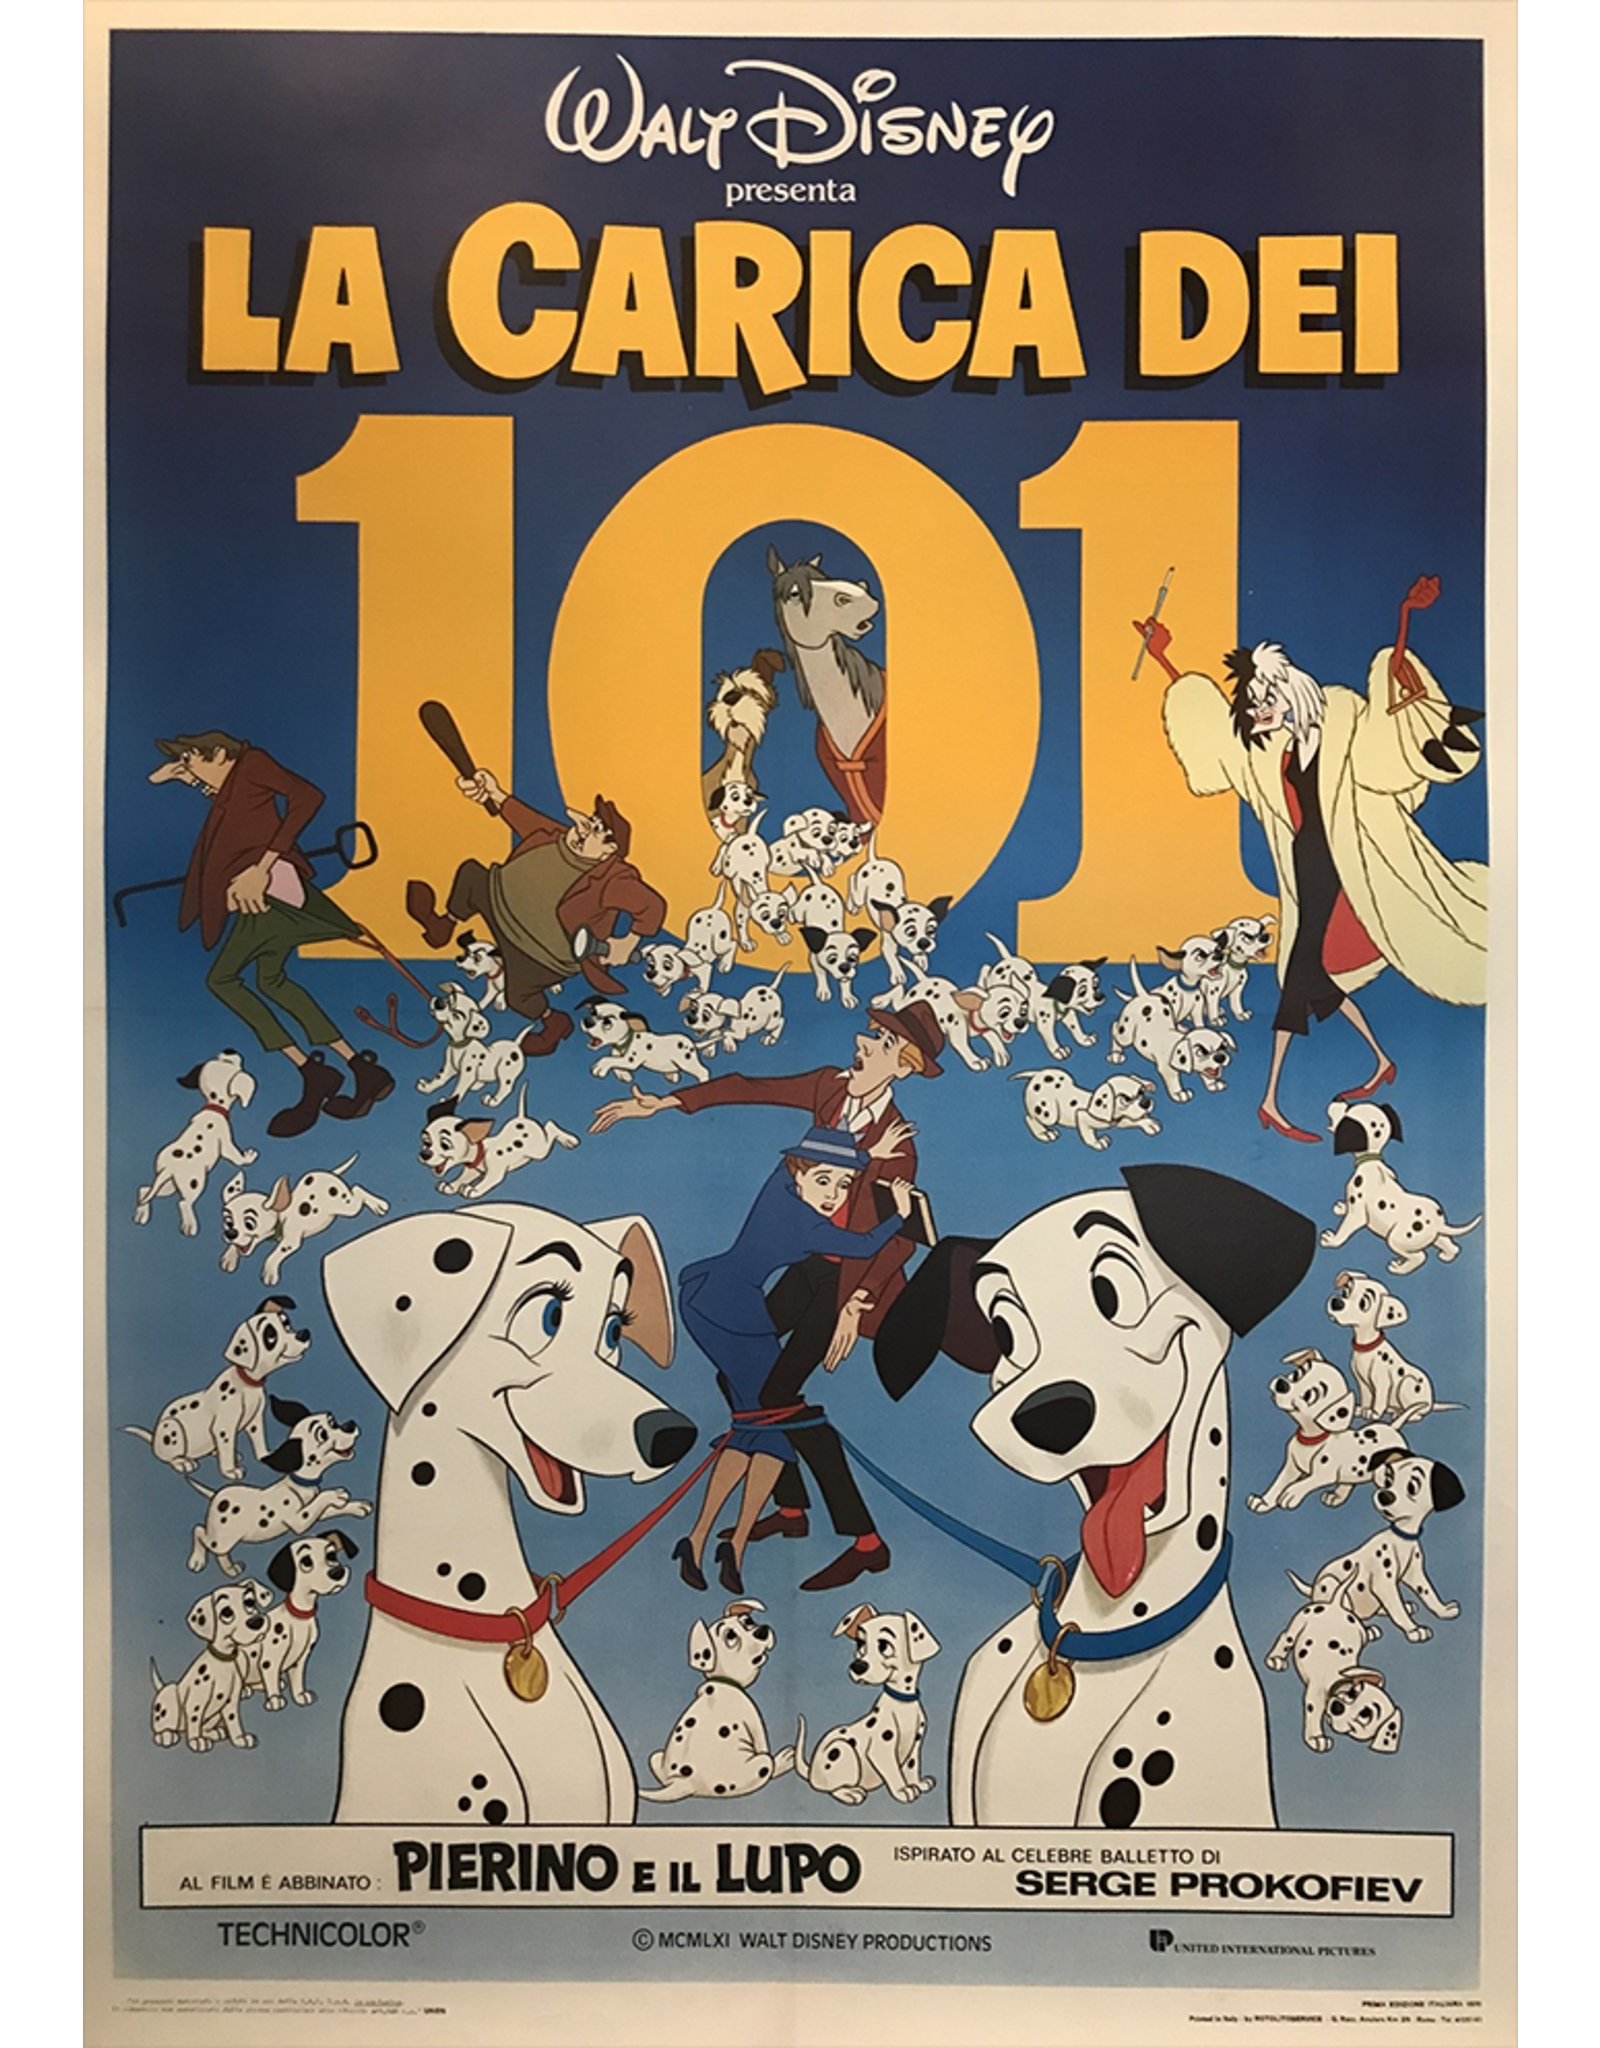 SPV Walt Disney La Carica Dei 101(Italian 101 Dalmatians)